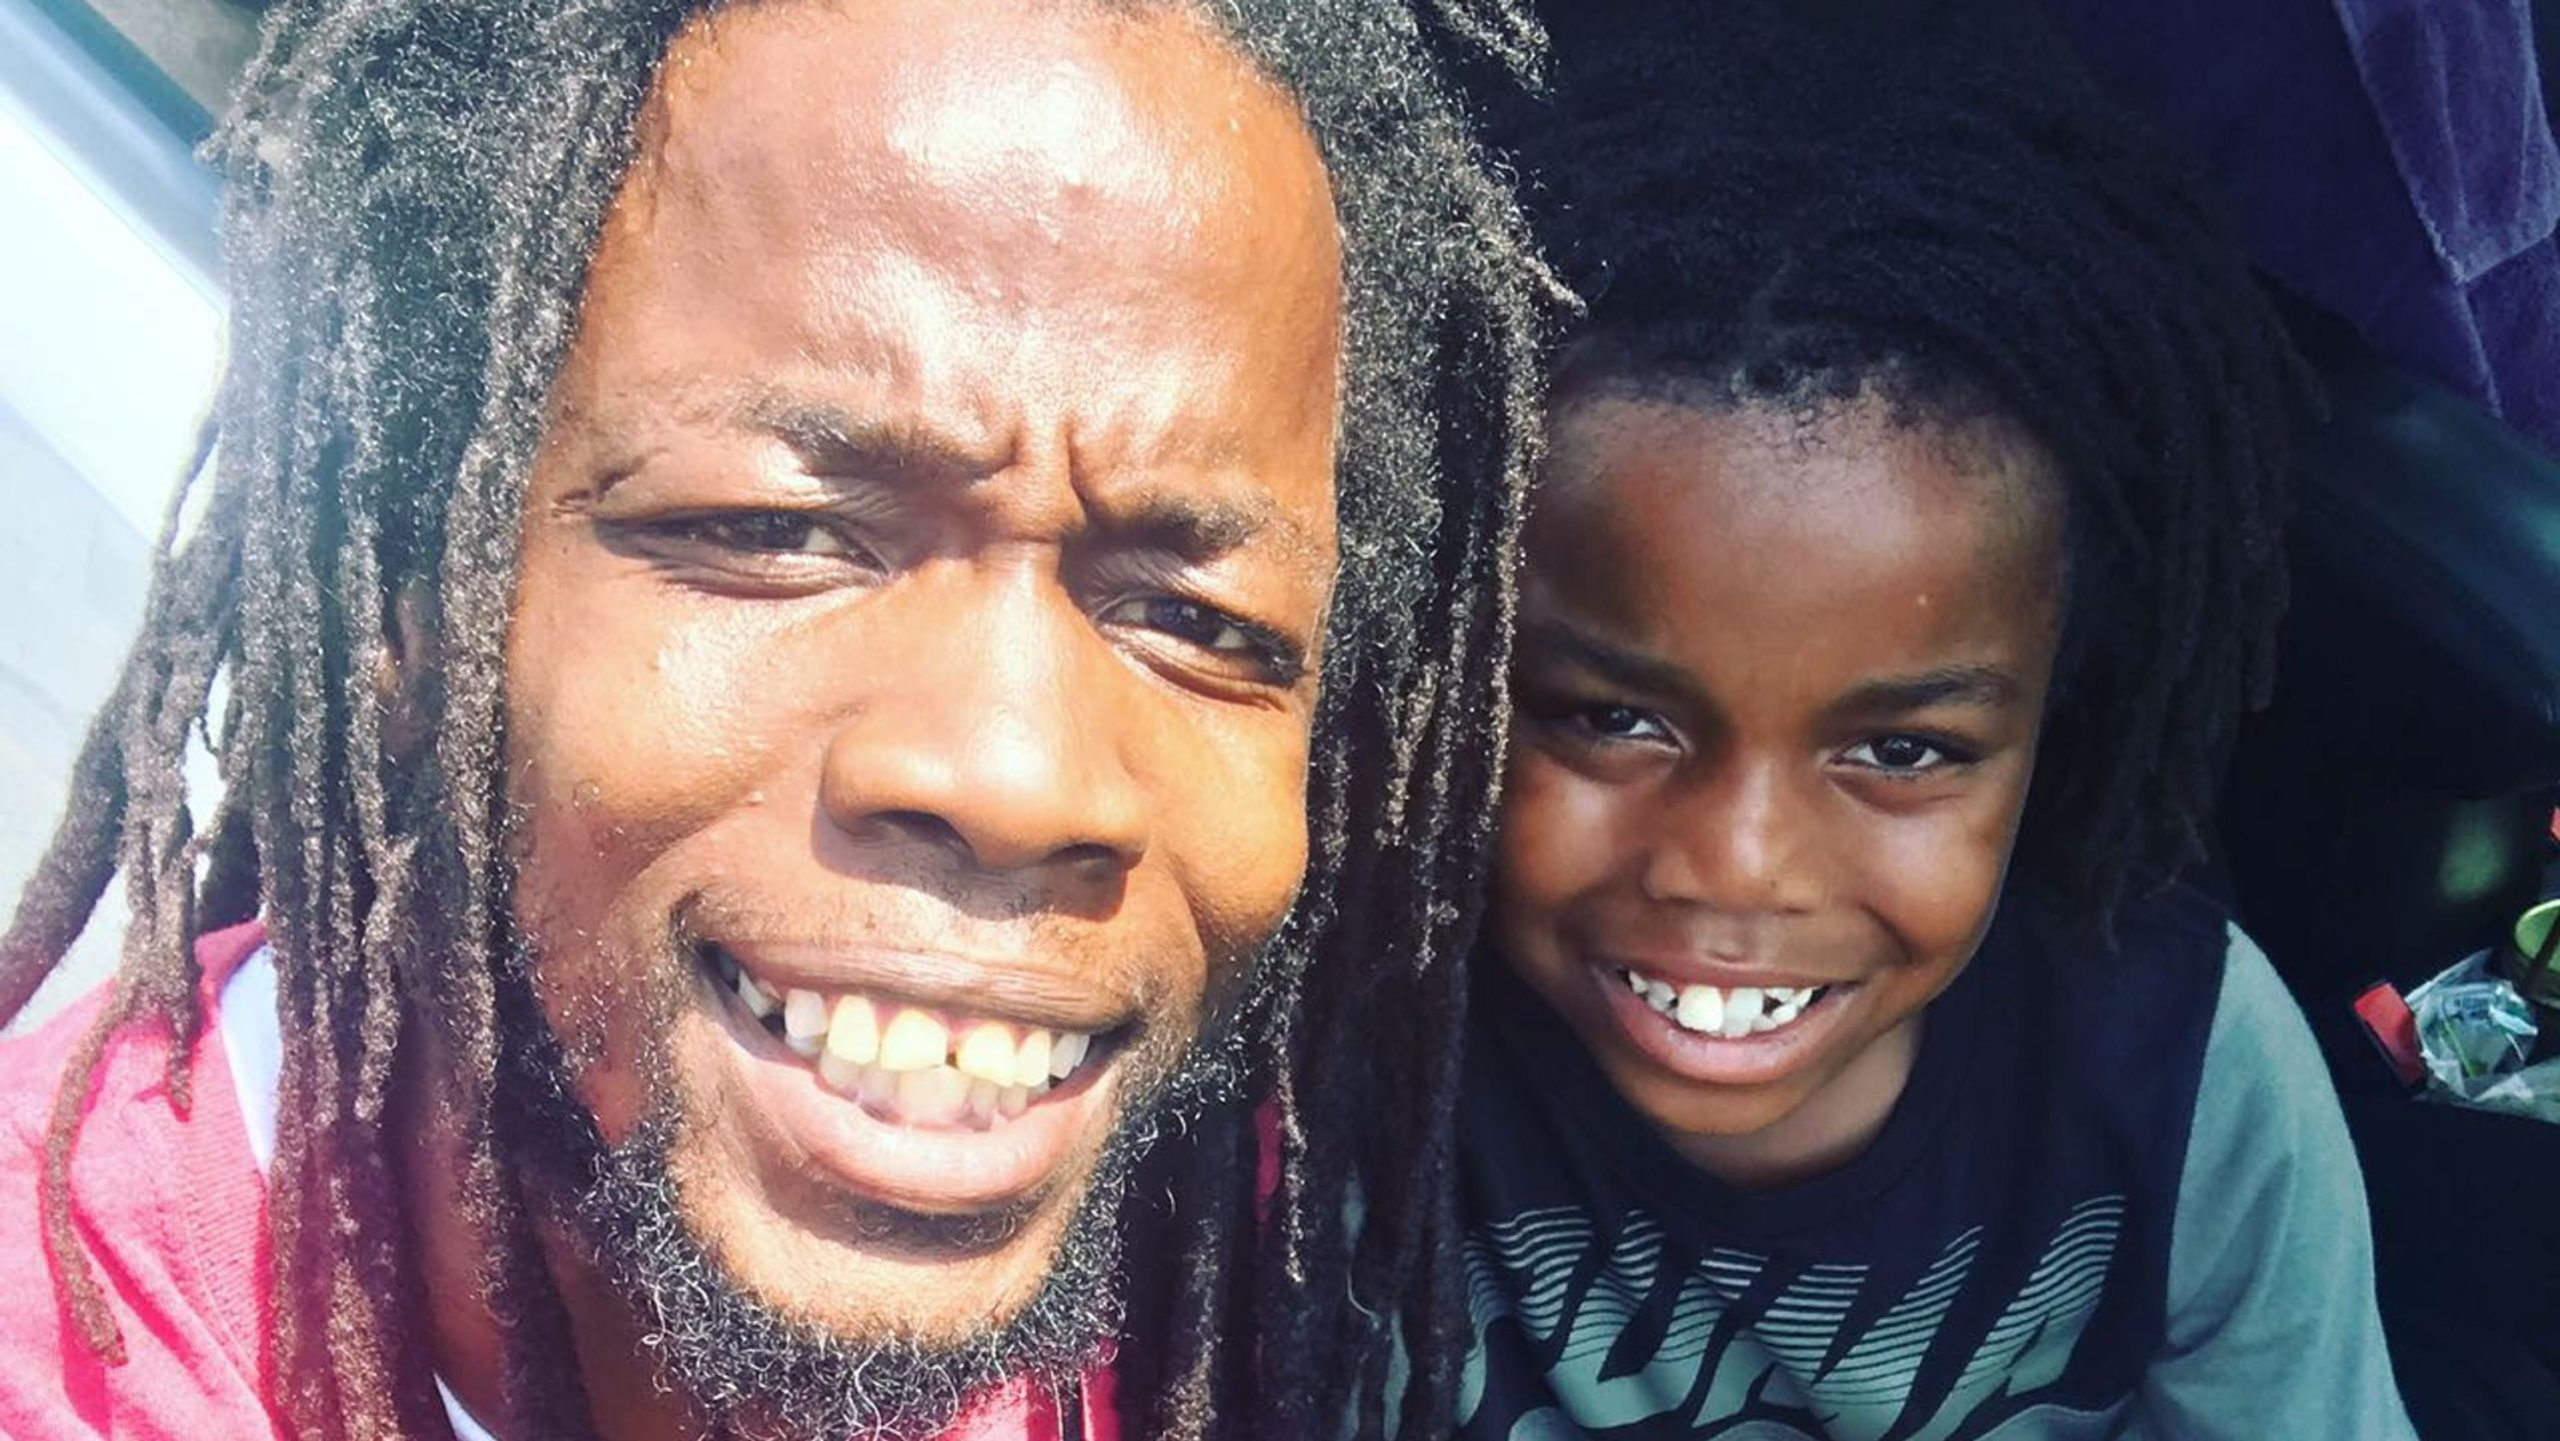 Jamaican-born musician sentenced to 8 years, no parole for marijuana